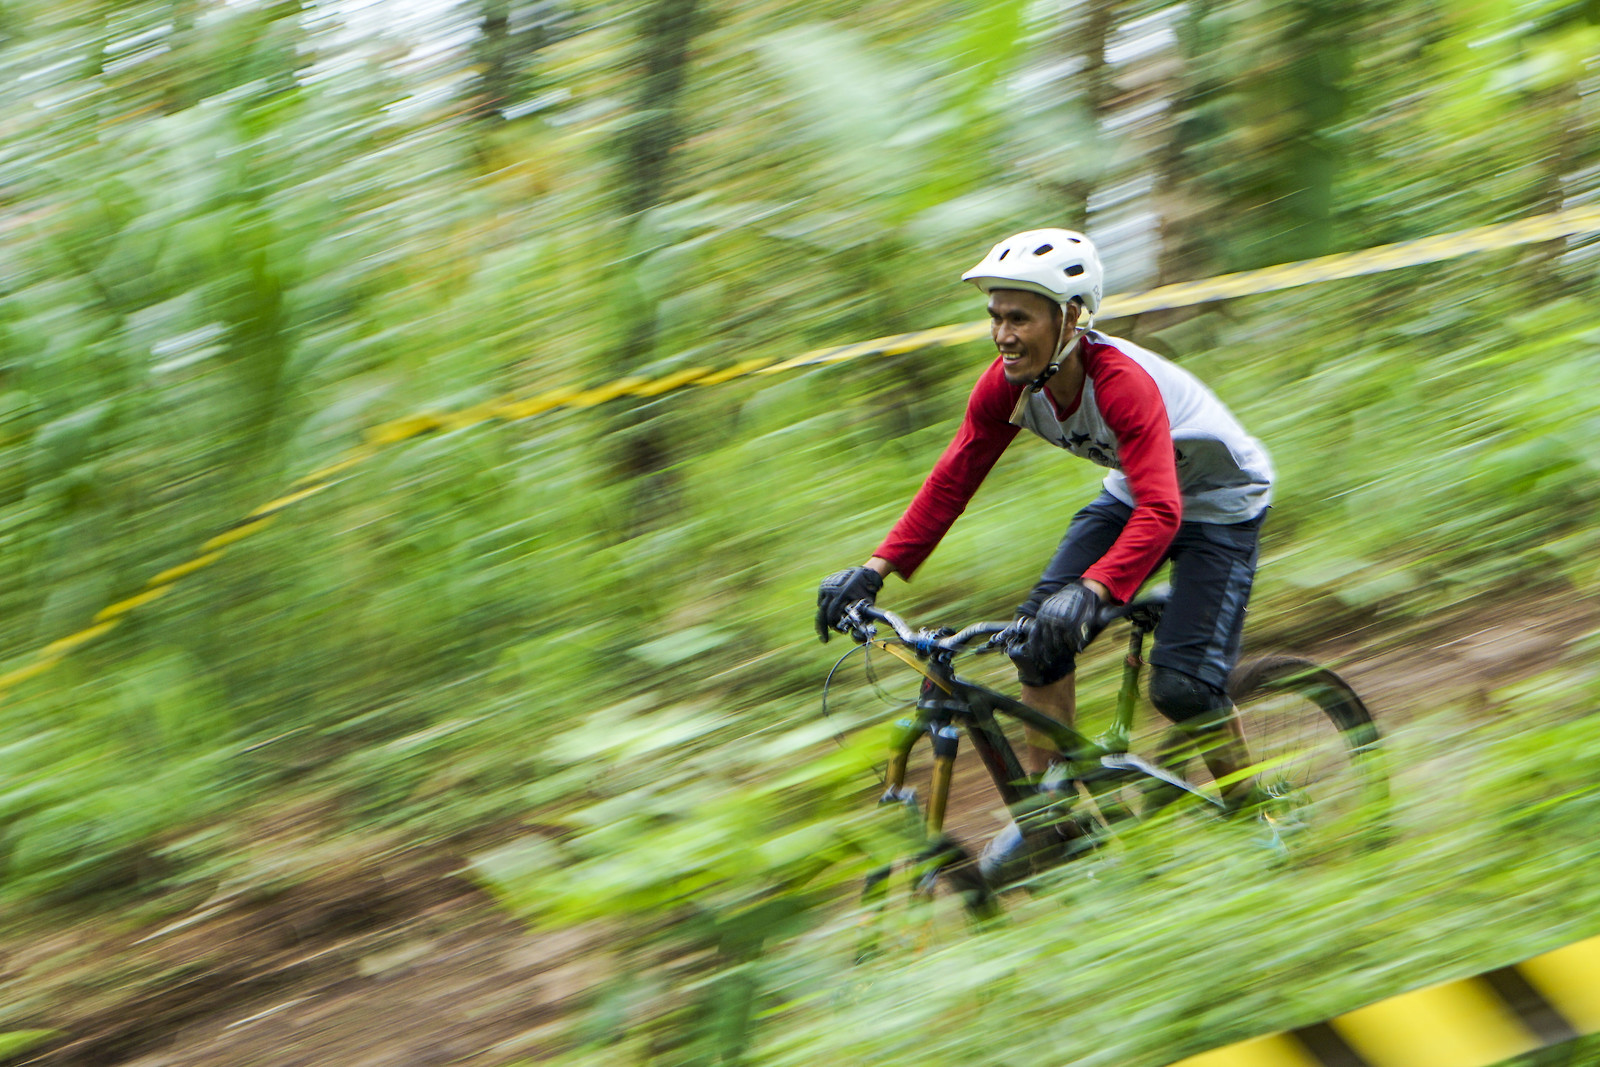 Pan tuesday - RezaAkhmad - Mountain Biking Pictures - Vital MTB